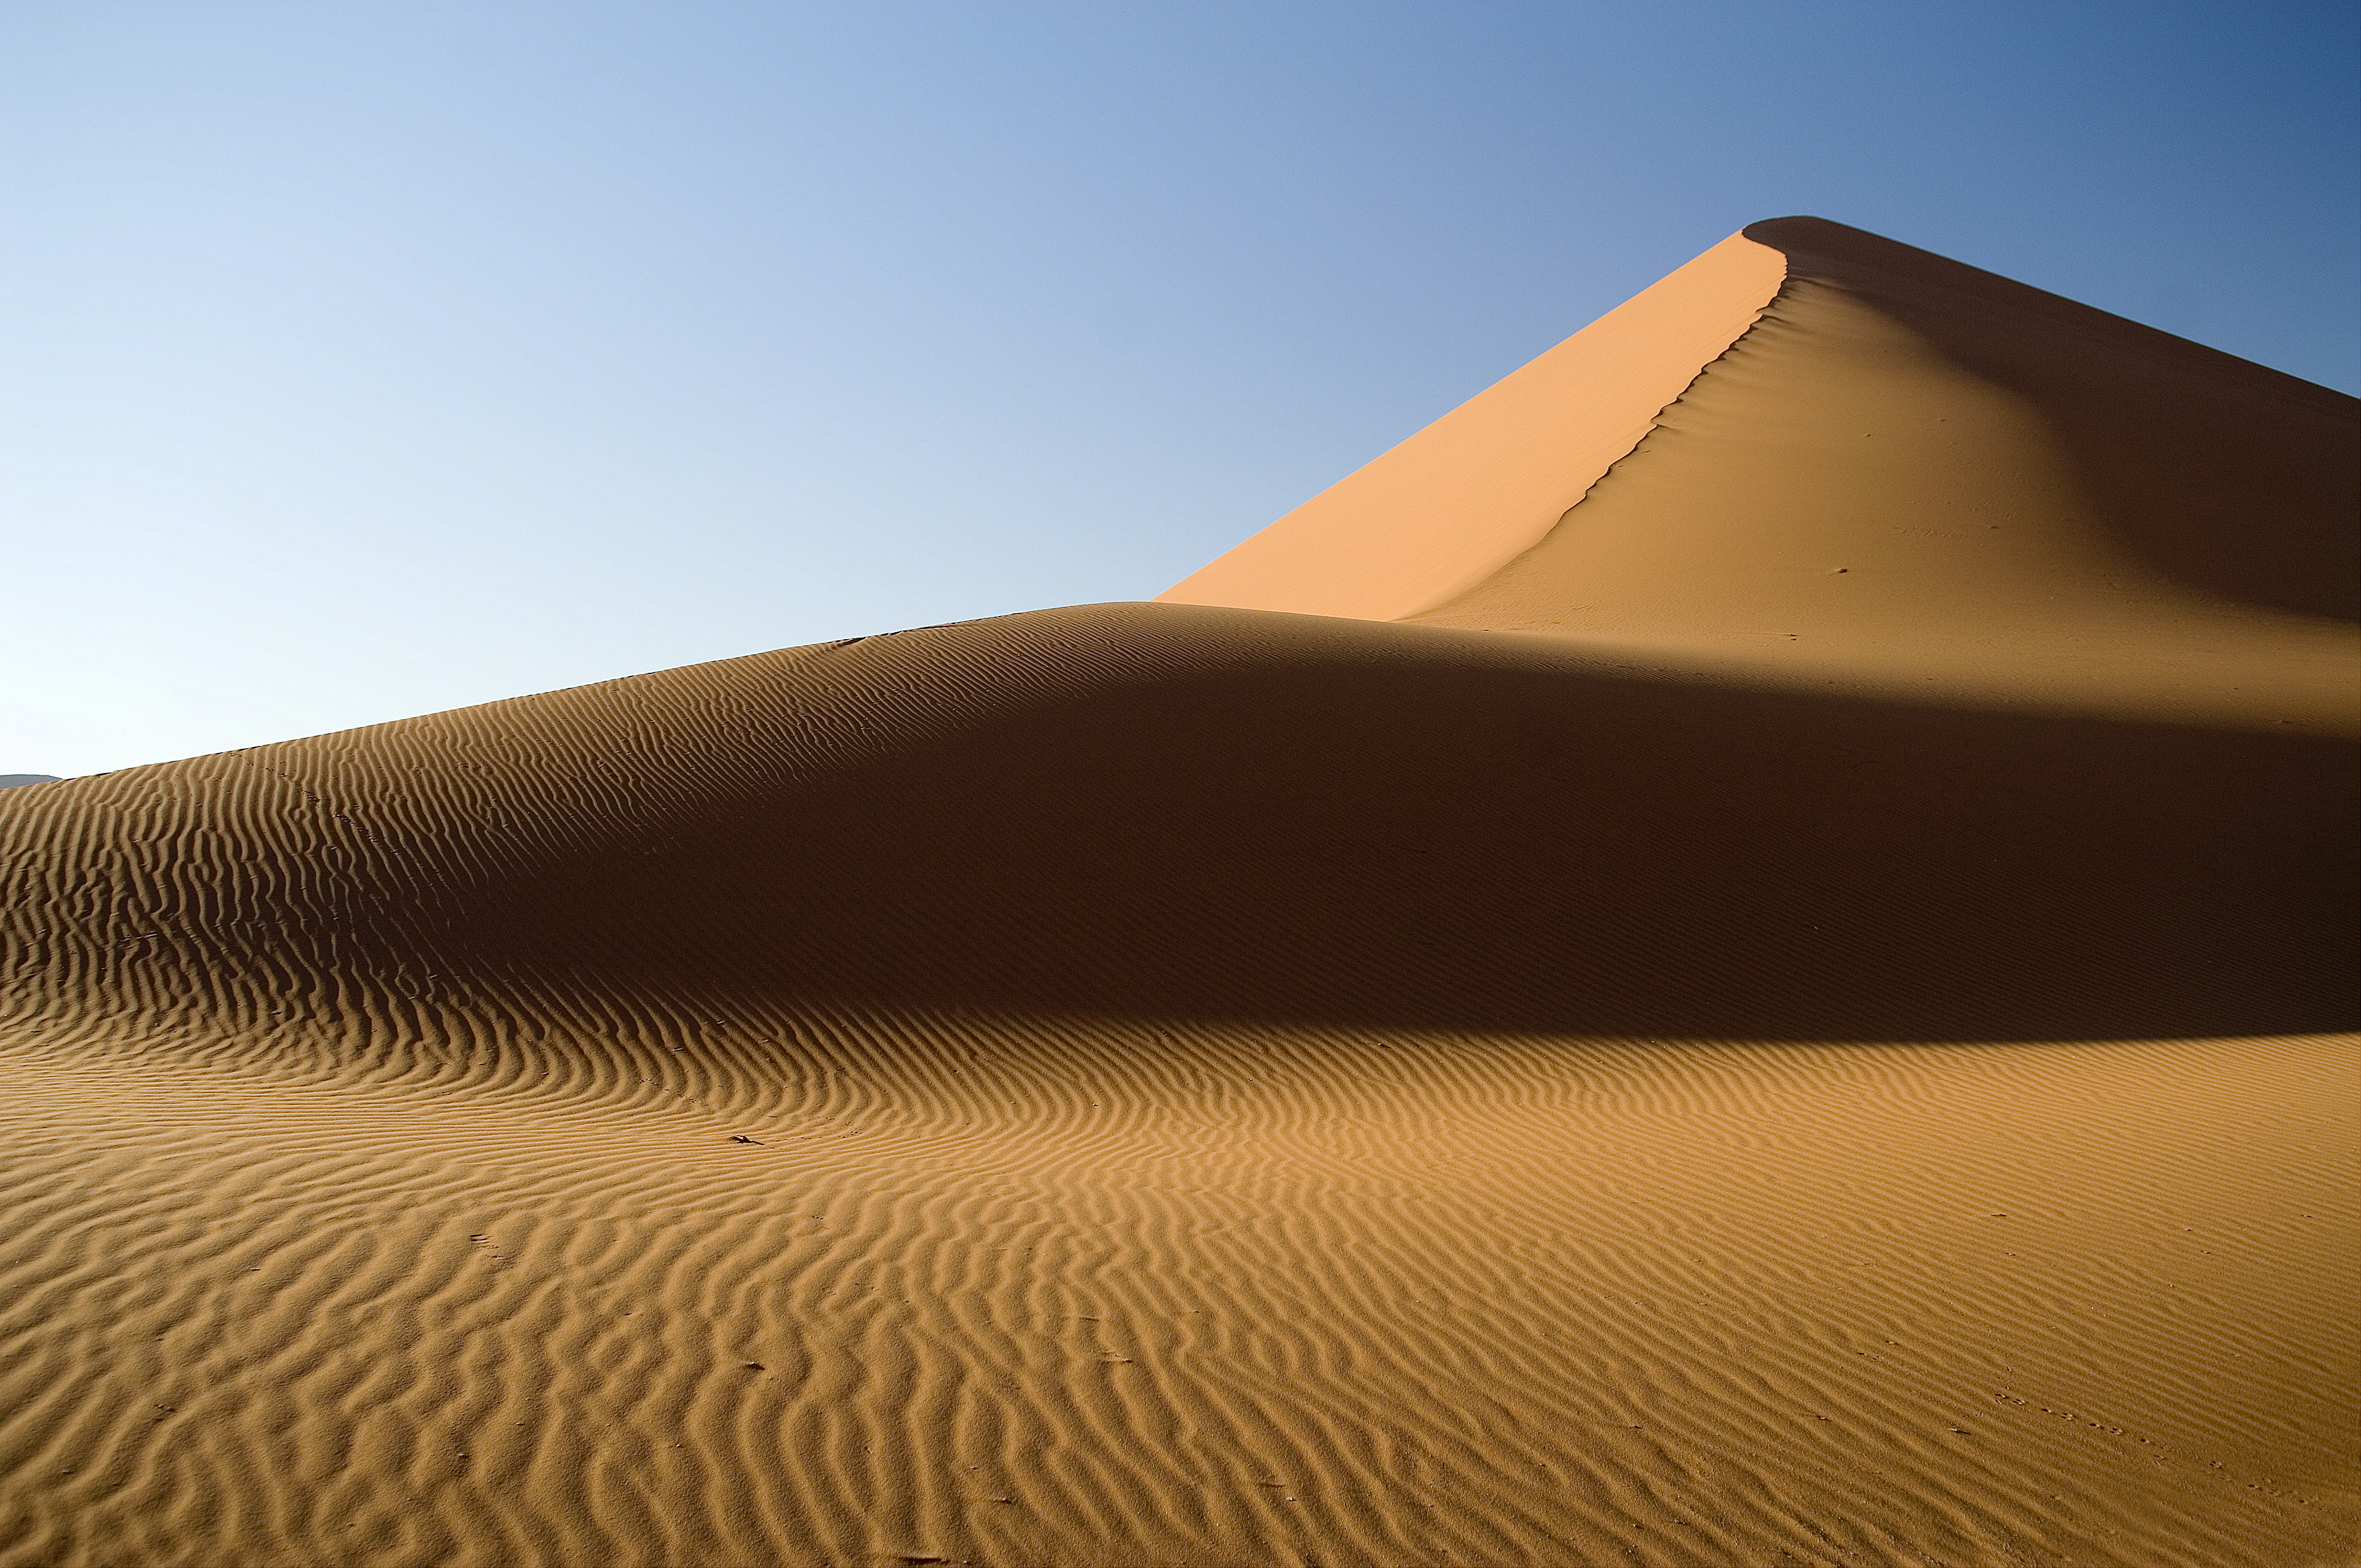 steep sand dune pursued - HD1200×800